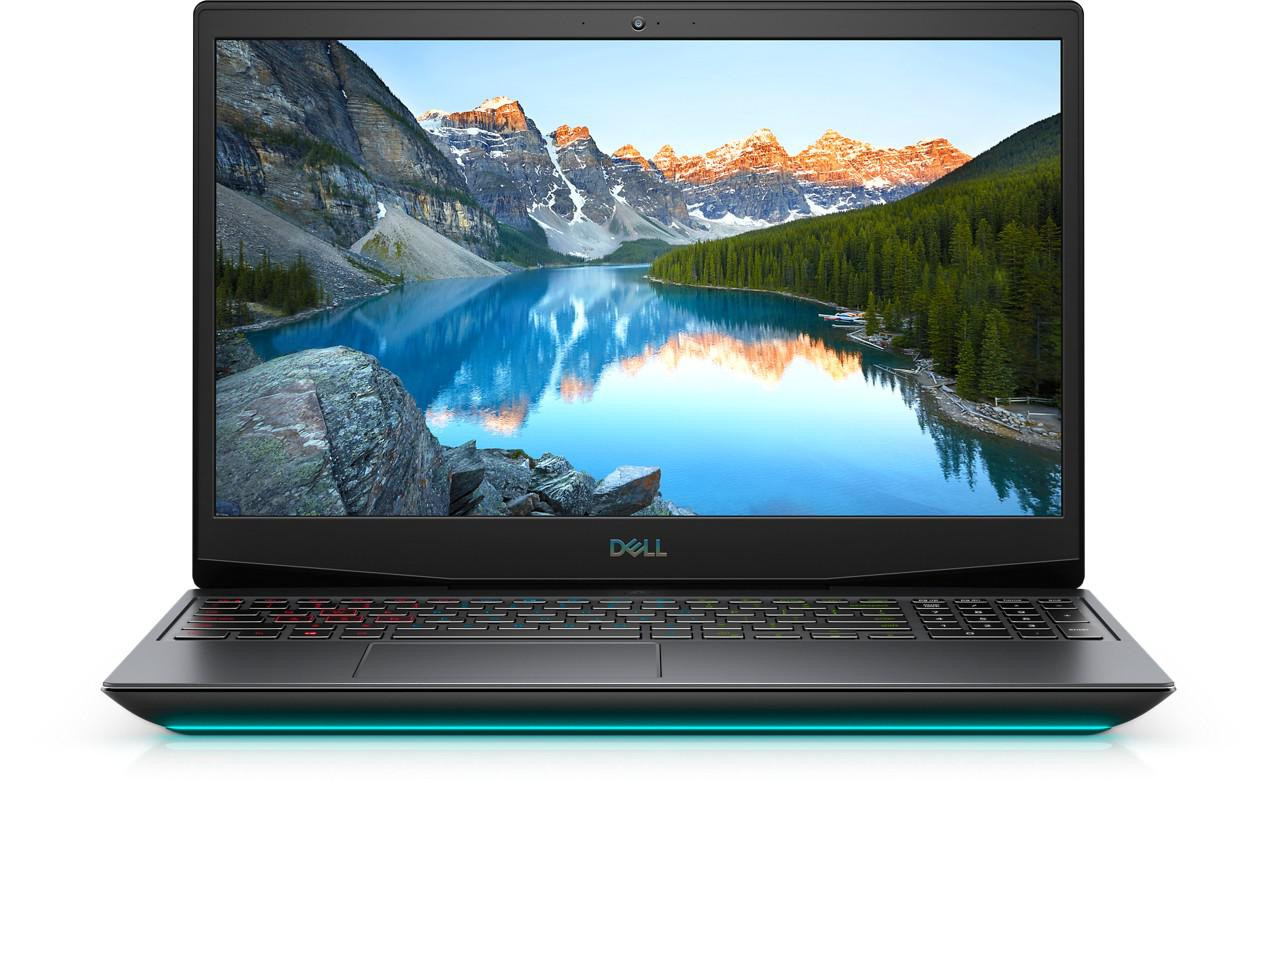 "Laptop Dell Inspiron Gaming 5500 G5, 15.6"" FHD, i7-10750H, 16GB, 1TB SSD, GeForce RTX 2060, Ubuntu - imaginea 1"